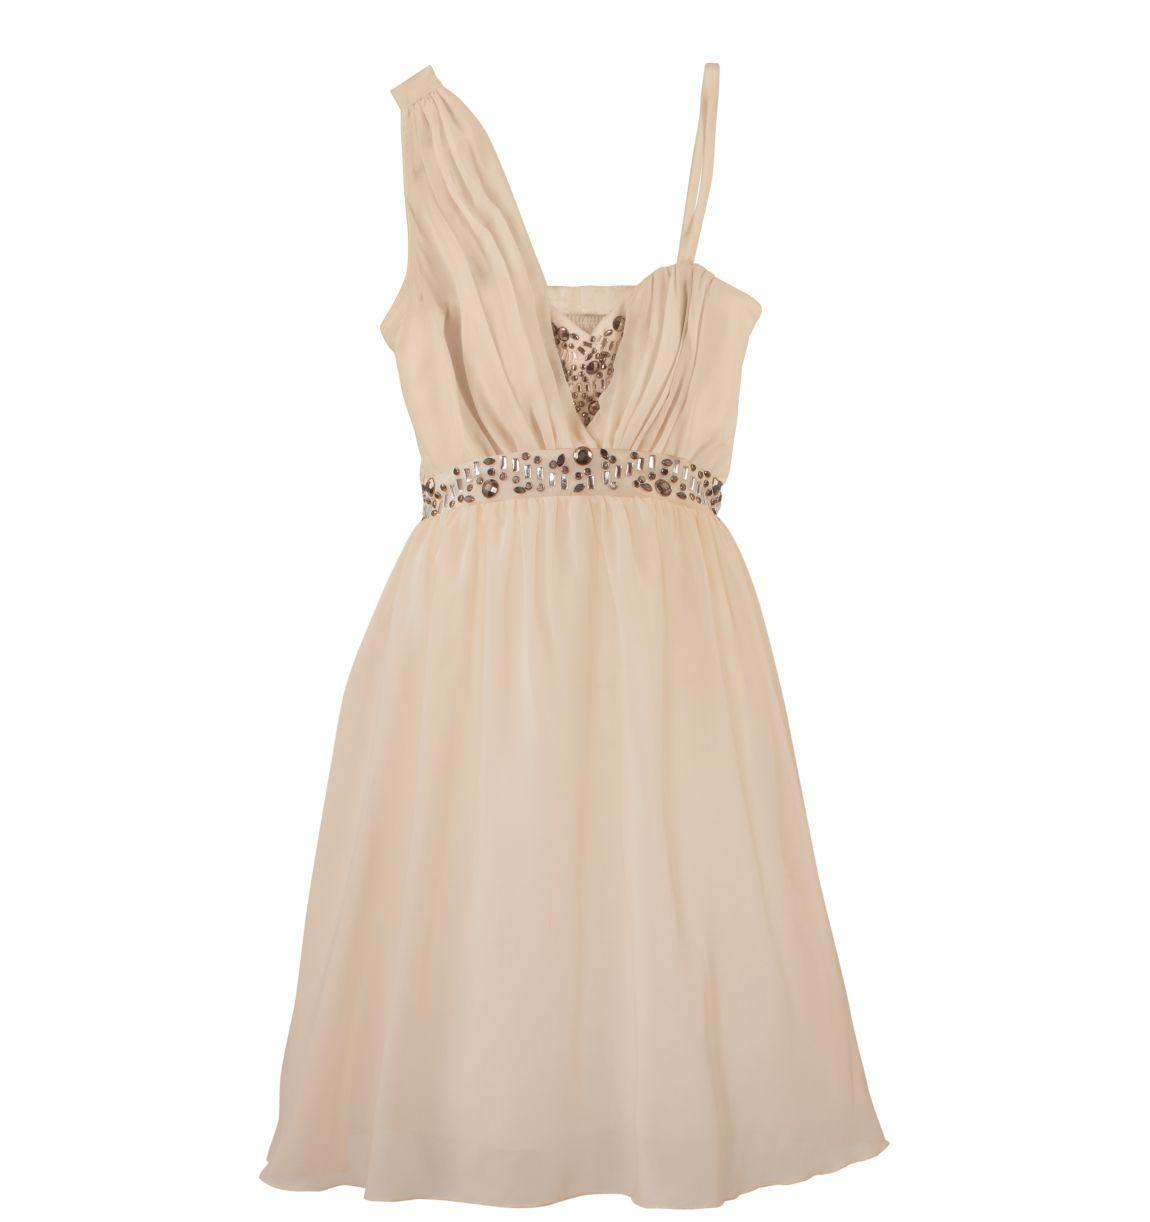 Embellished Prom Dress - foschini | Dresses | Pinterest | Prom ...